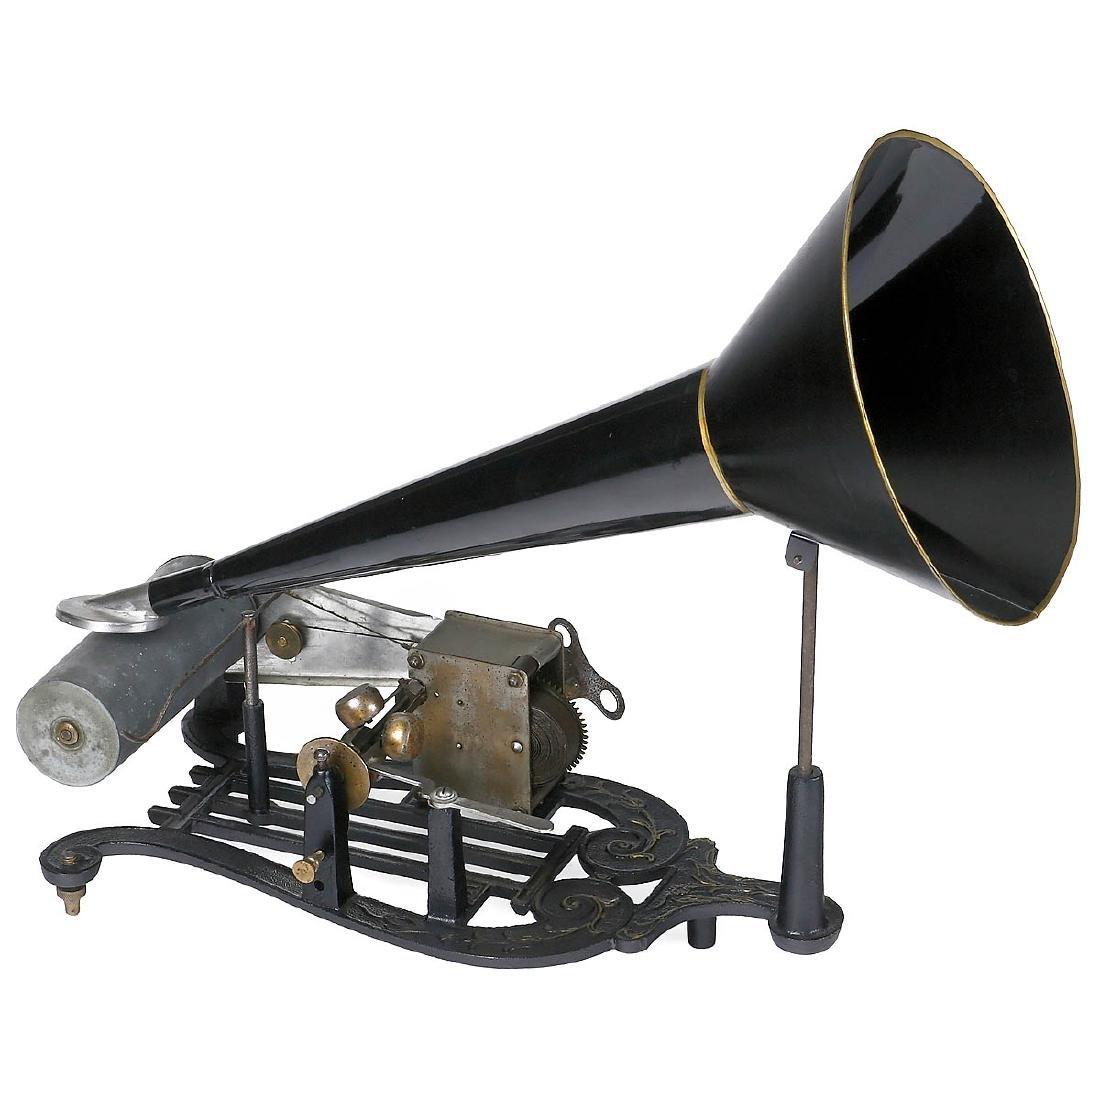 2 Cylinder Phonographs, c. 1900 - 2